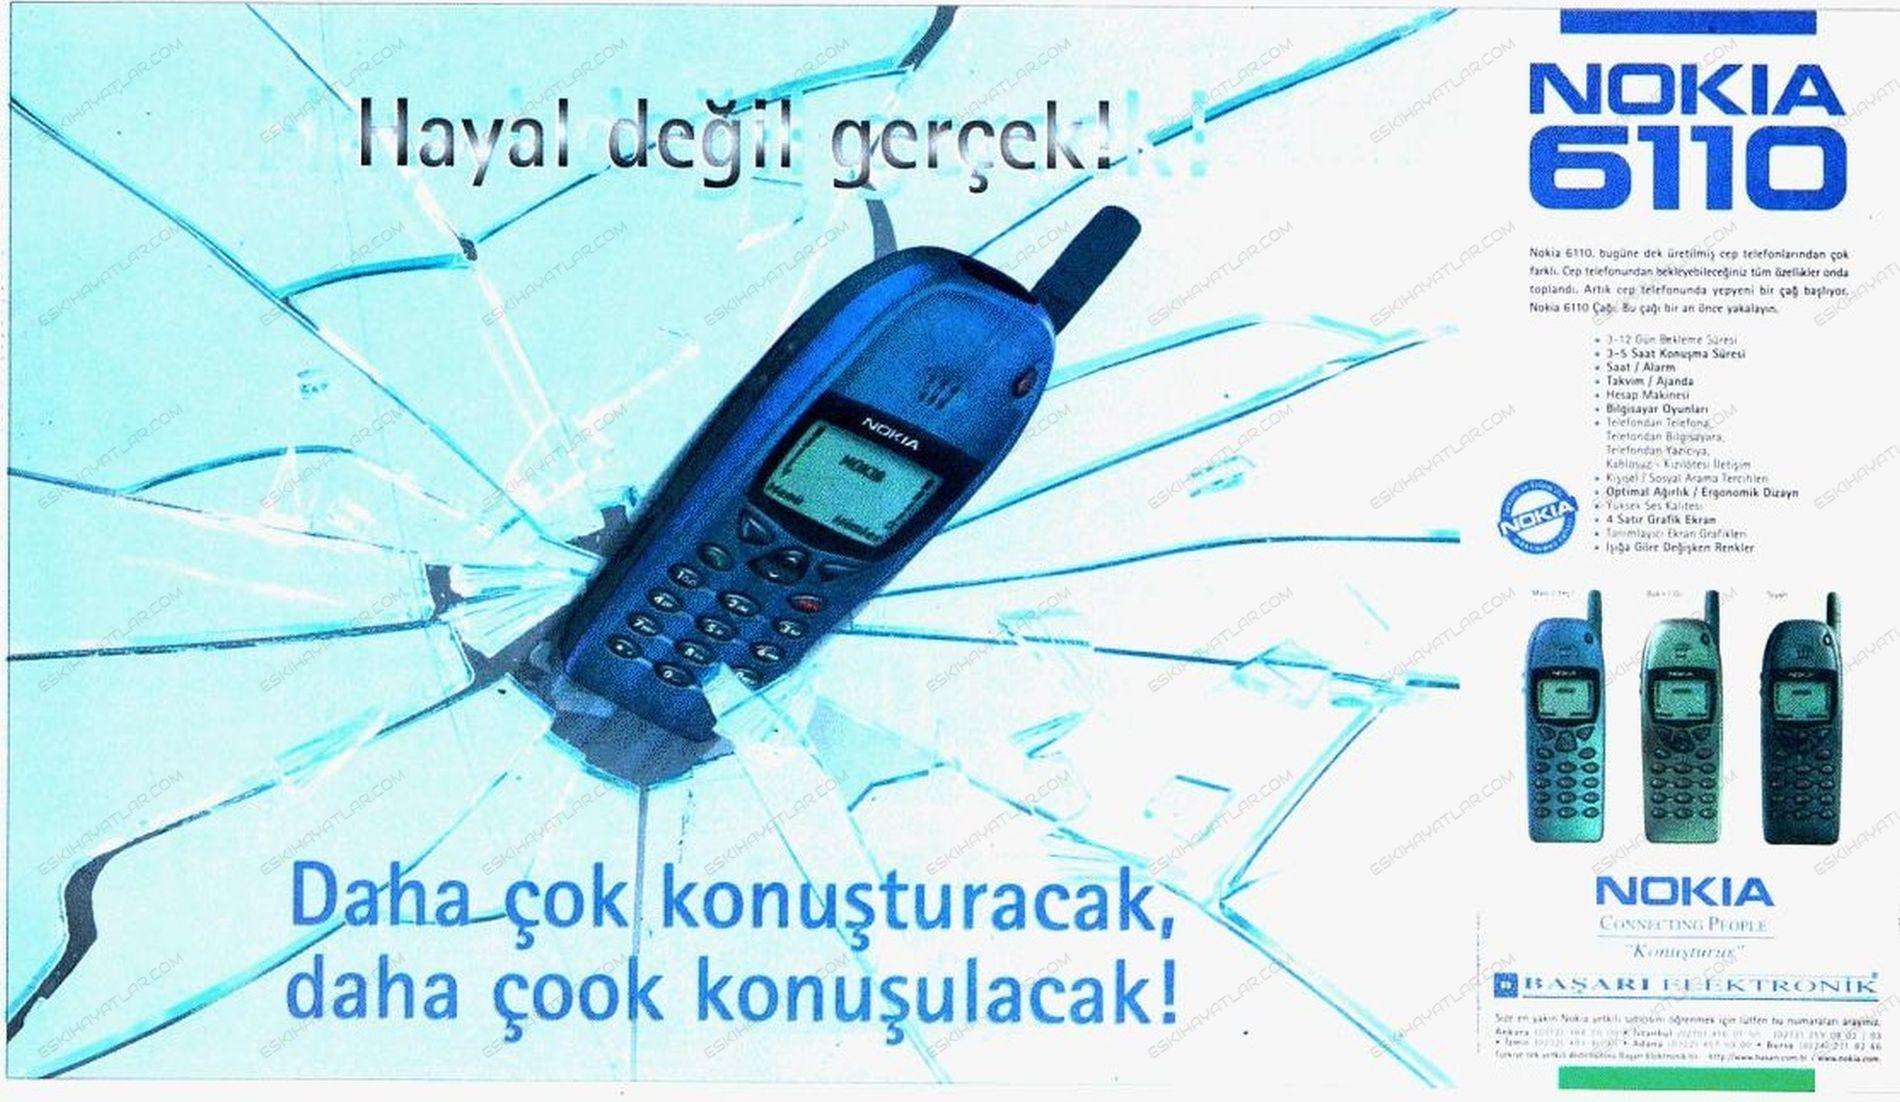 0139-nokia-6110-reklami-kizilotesi-telefonlar-1998-basari-elektronik